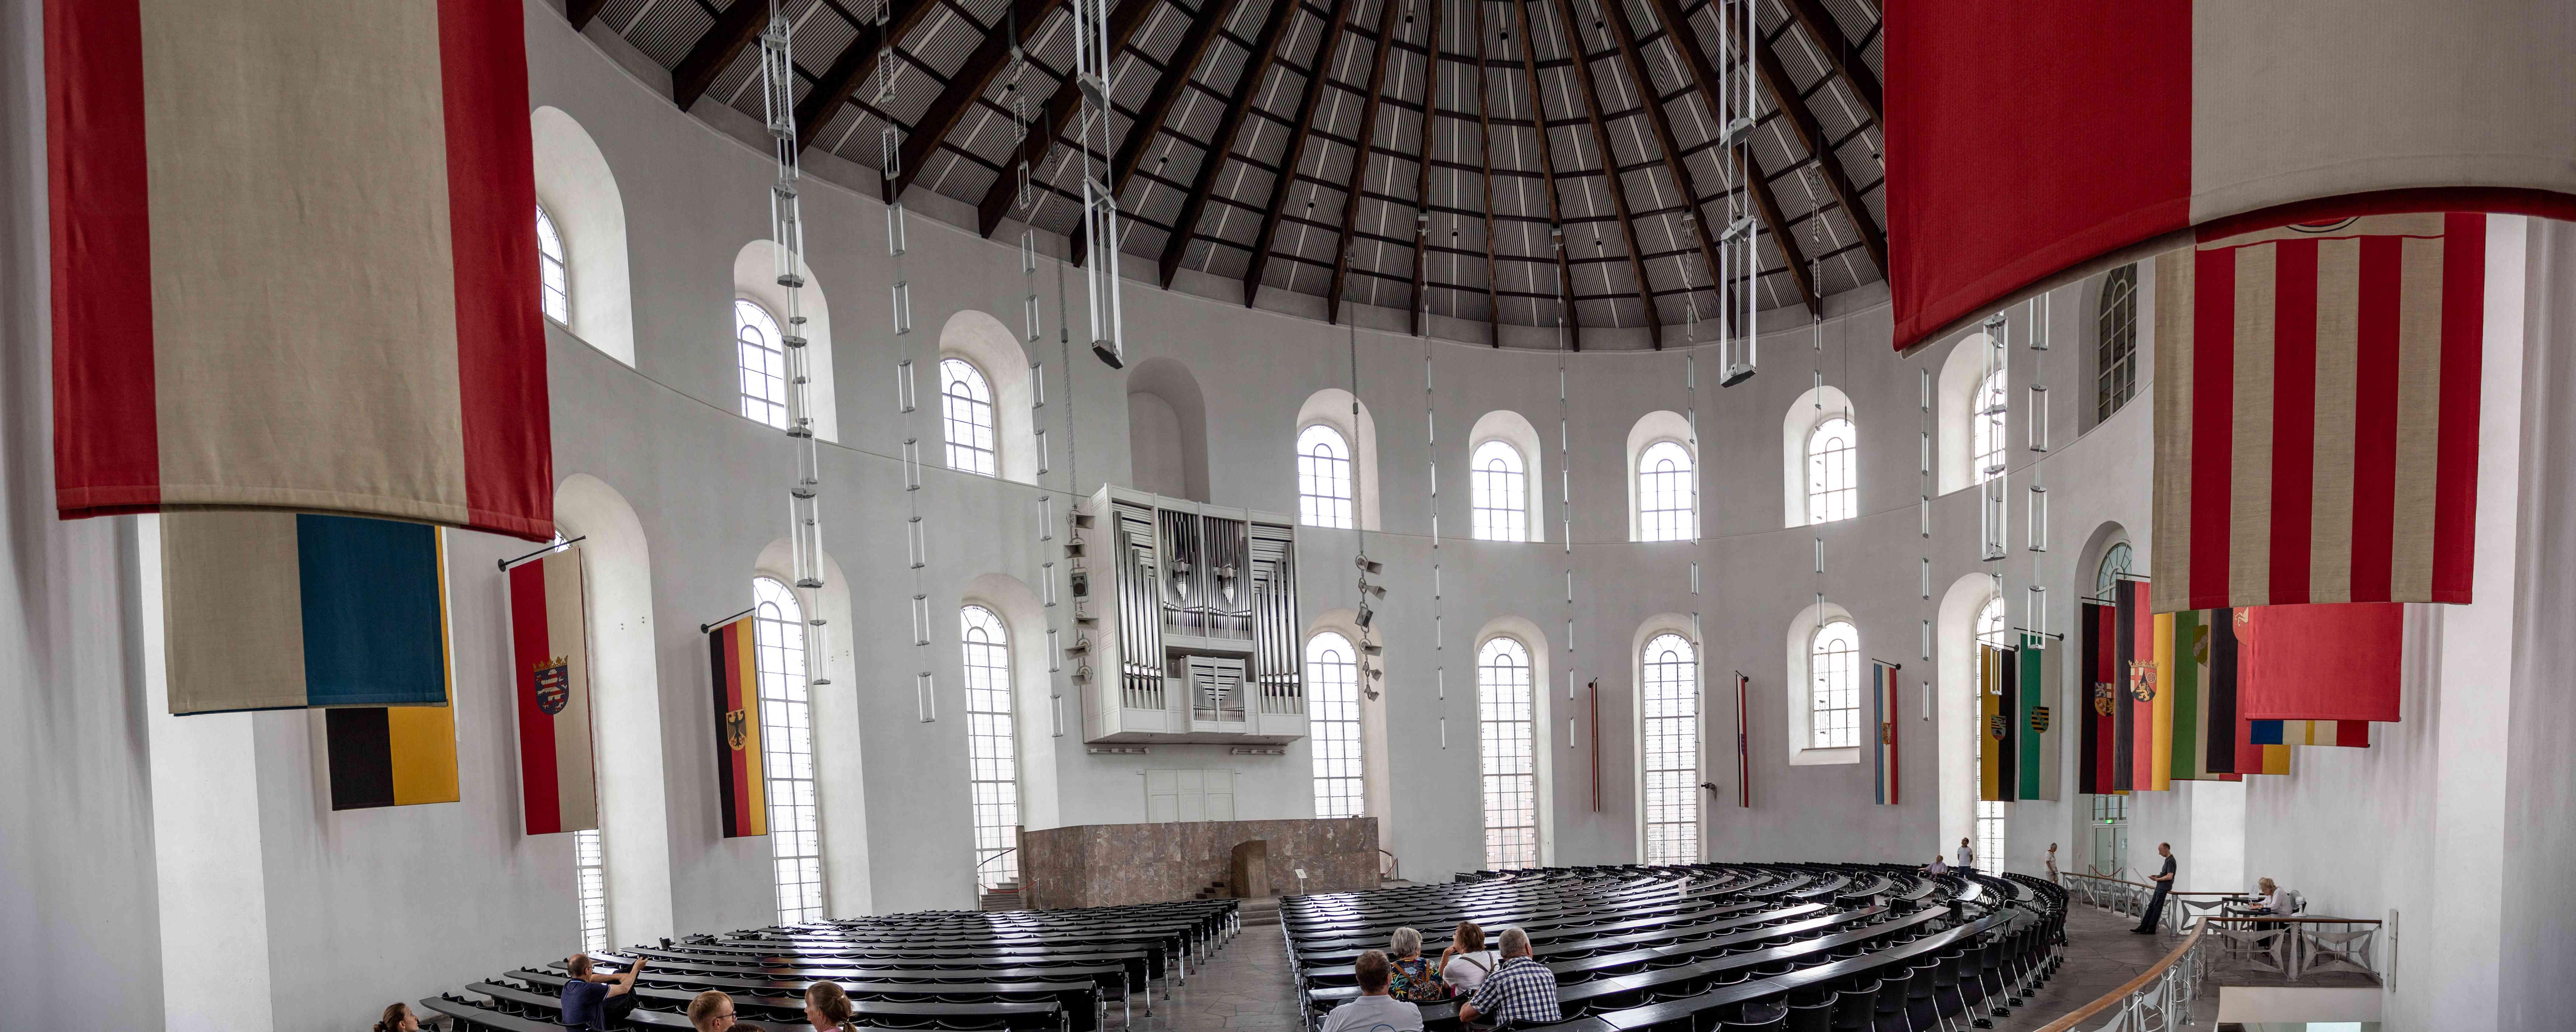 Inside of Paulskirche